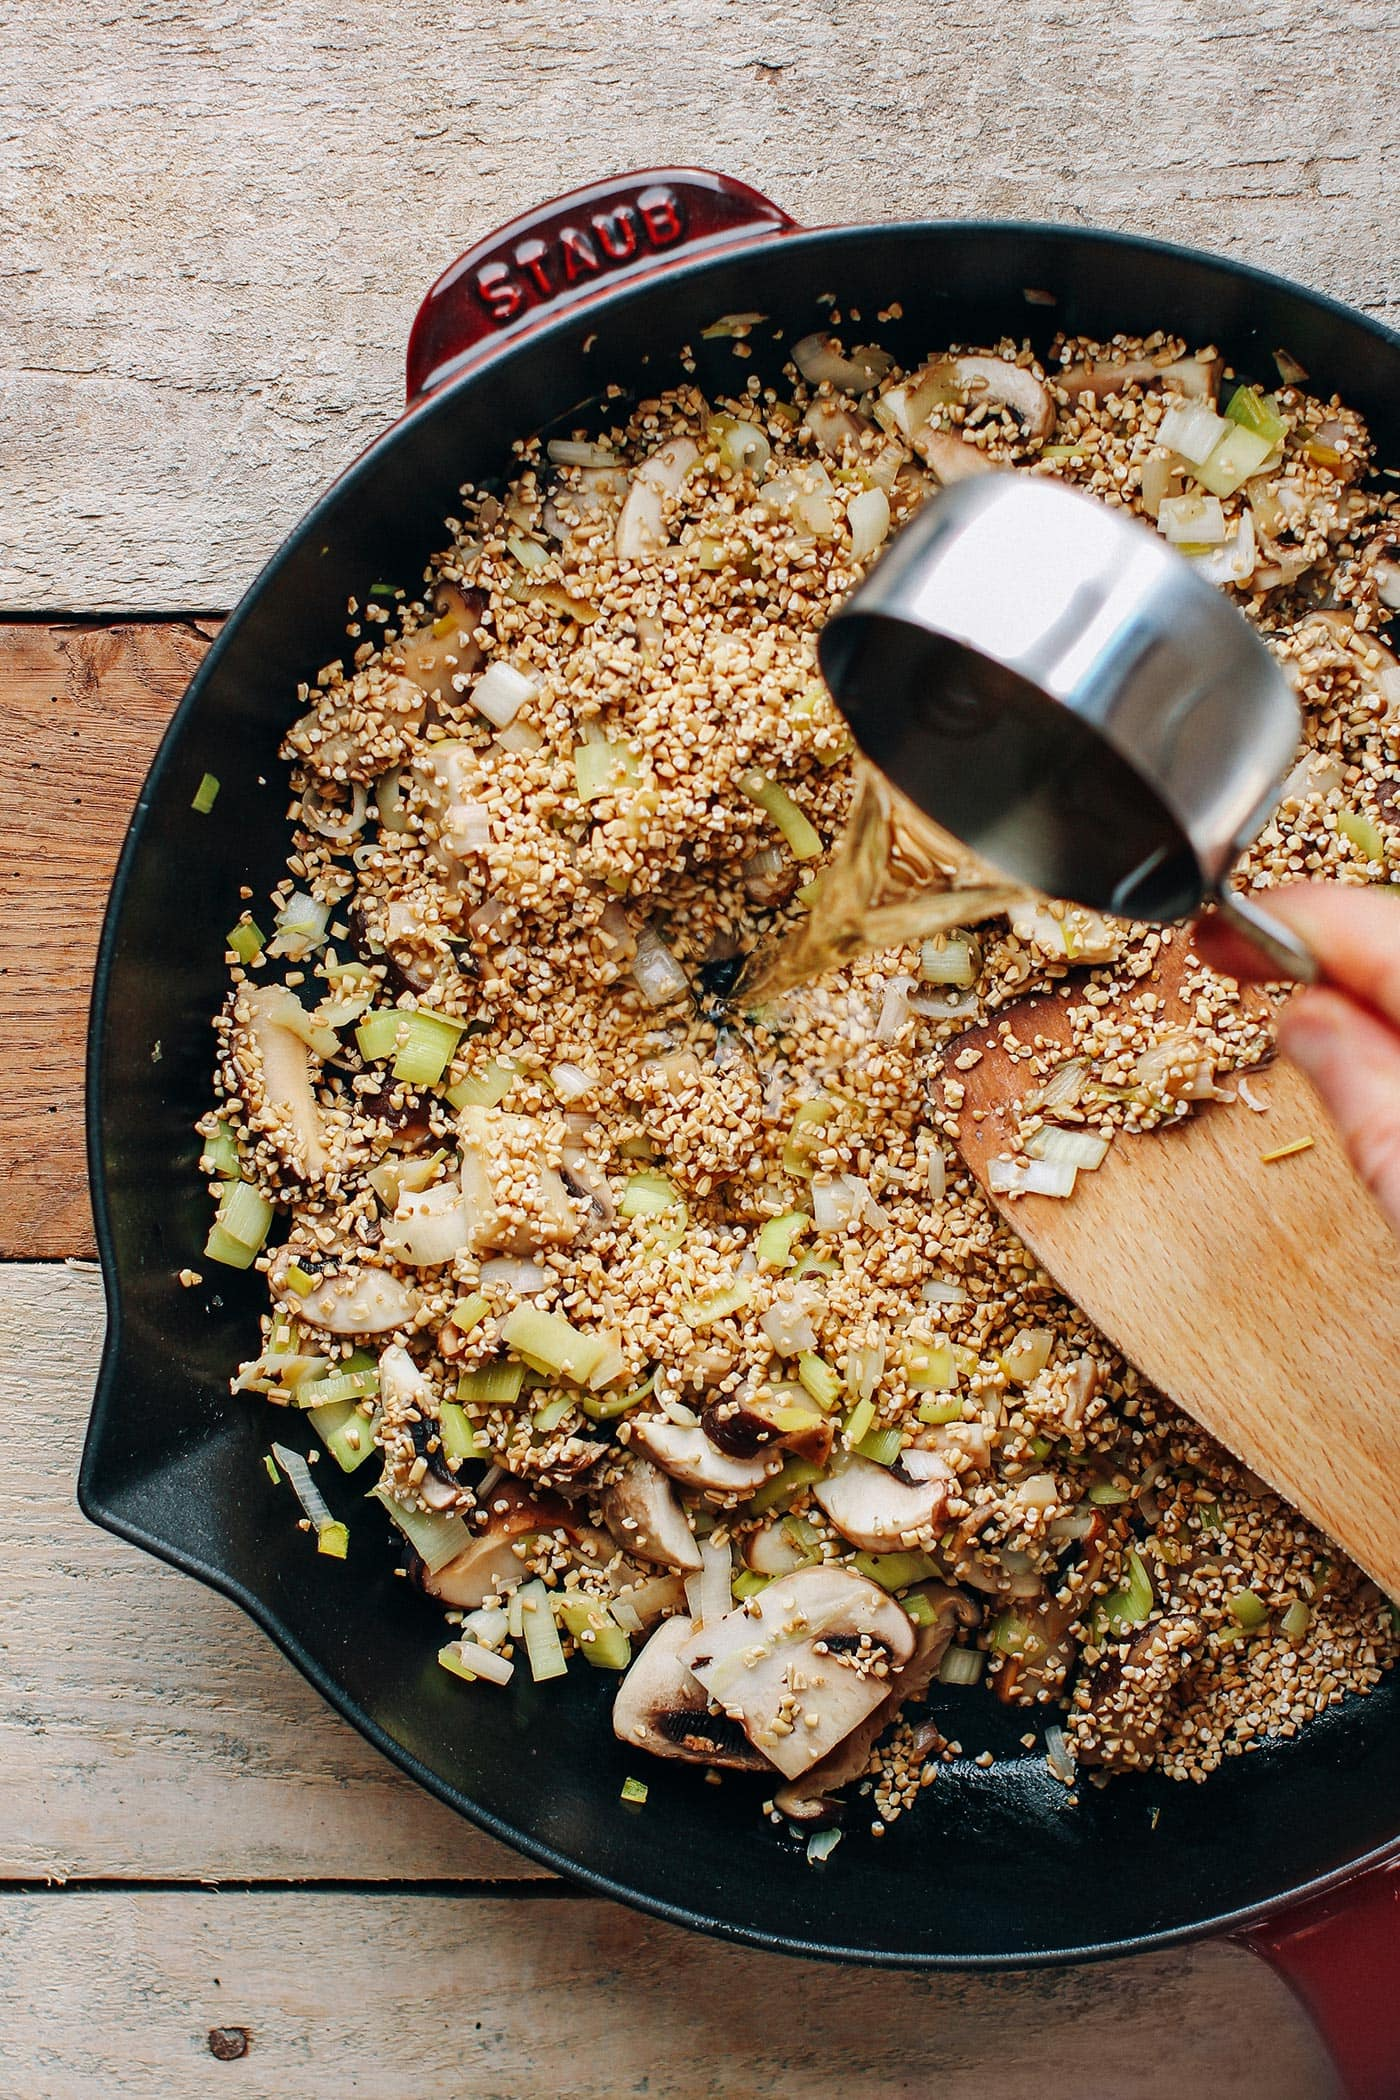 Hasselback Butternut Squash with Steel-Cut Oats Mushroom Risotto